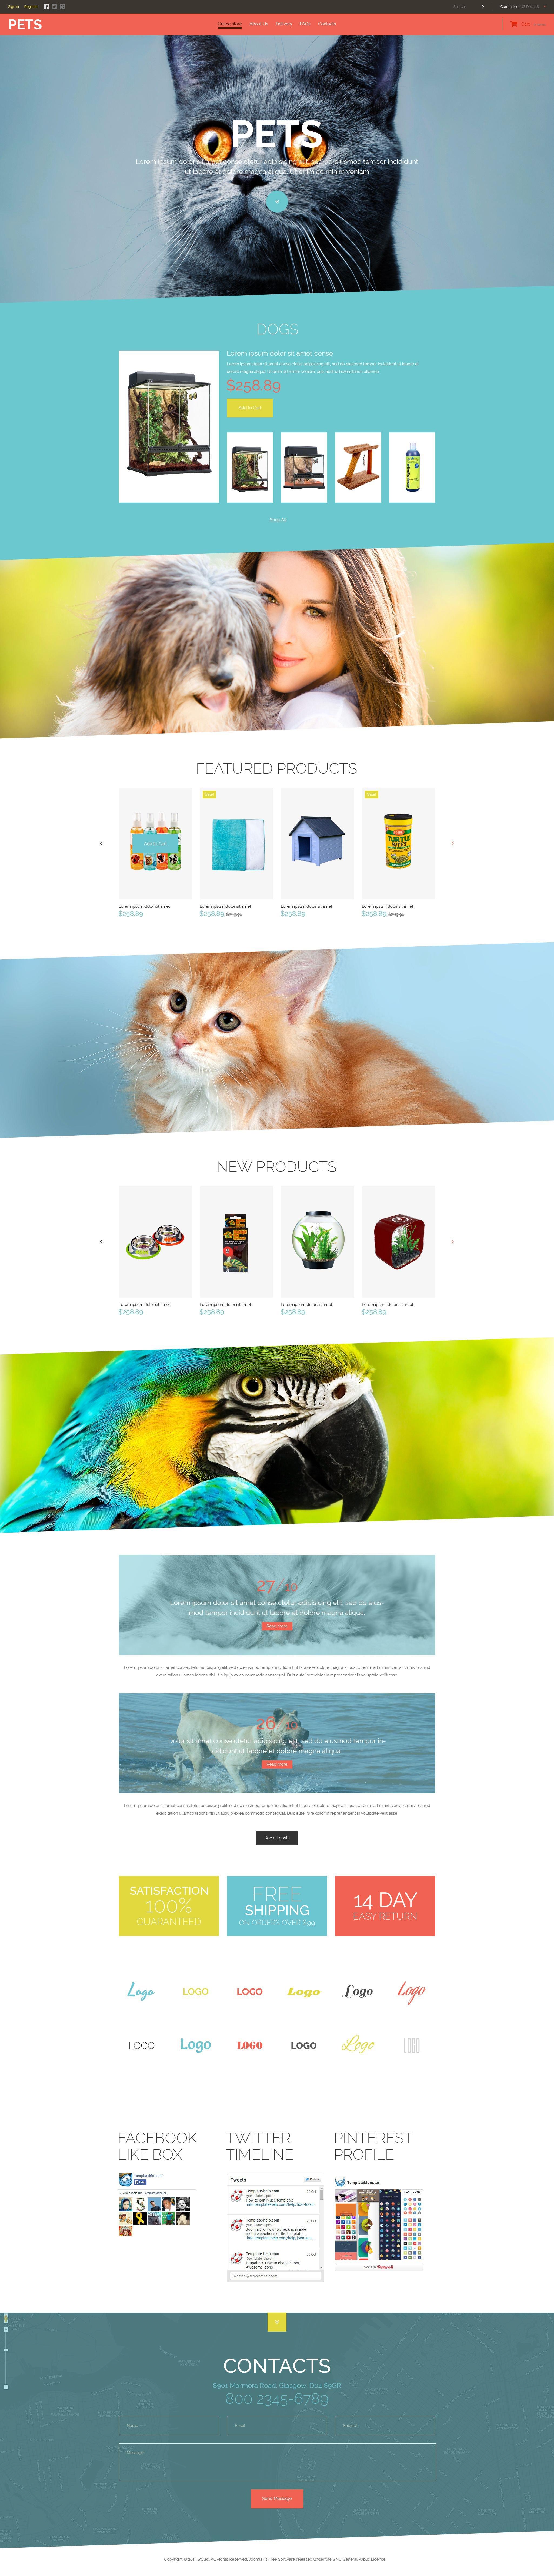 Pet Store №52331 - скриншот